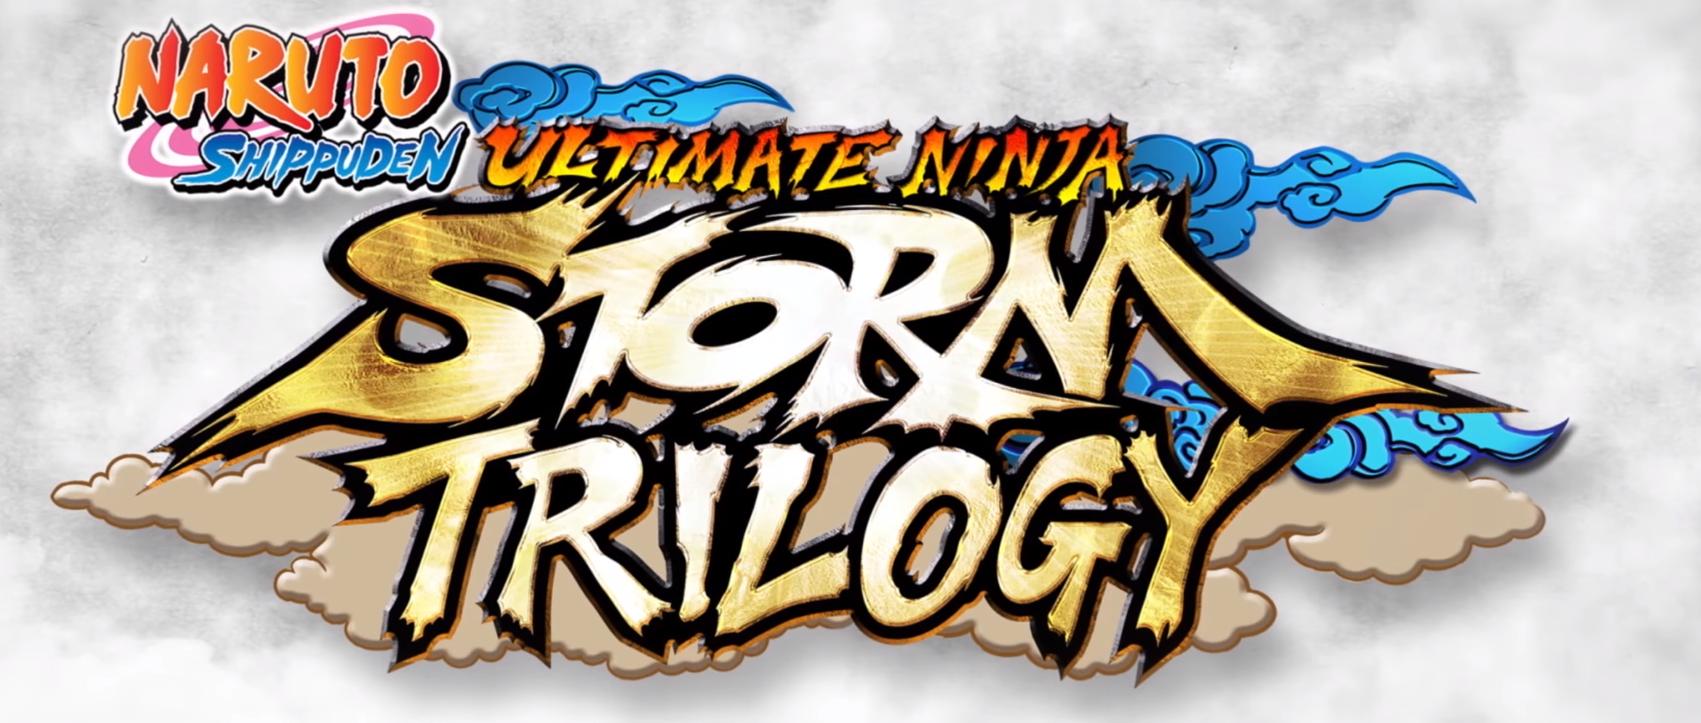 Naruto Shippuden Ultimate Ninja Storm Trilogy full